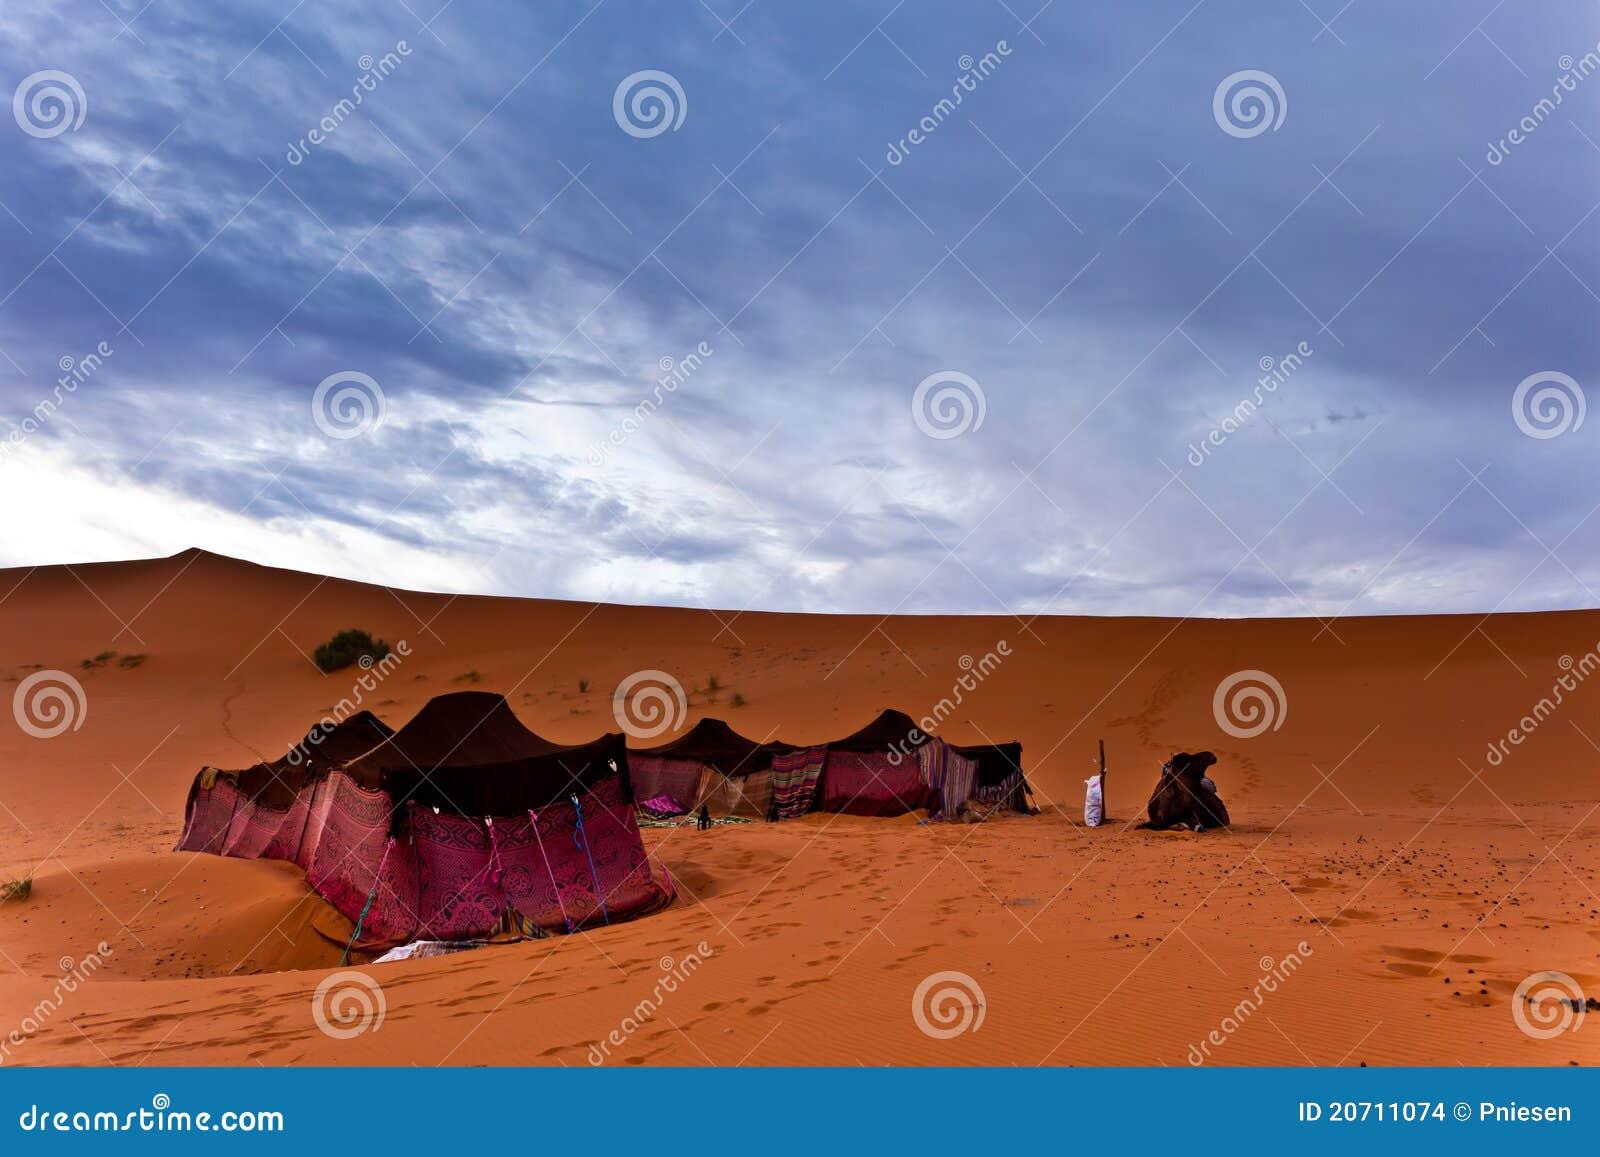 bedouin tents in the sahara desert stock images image